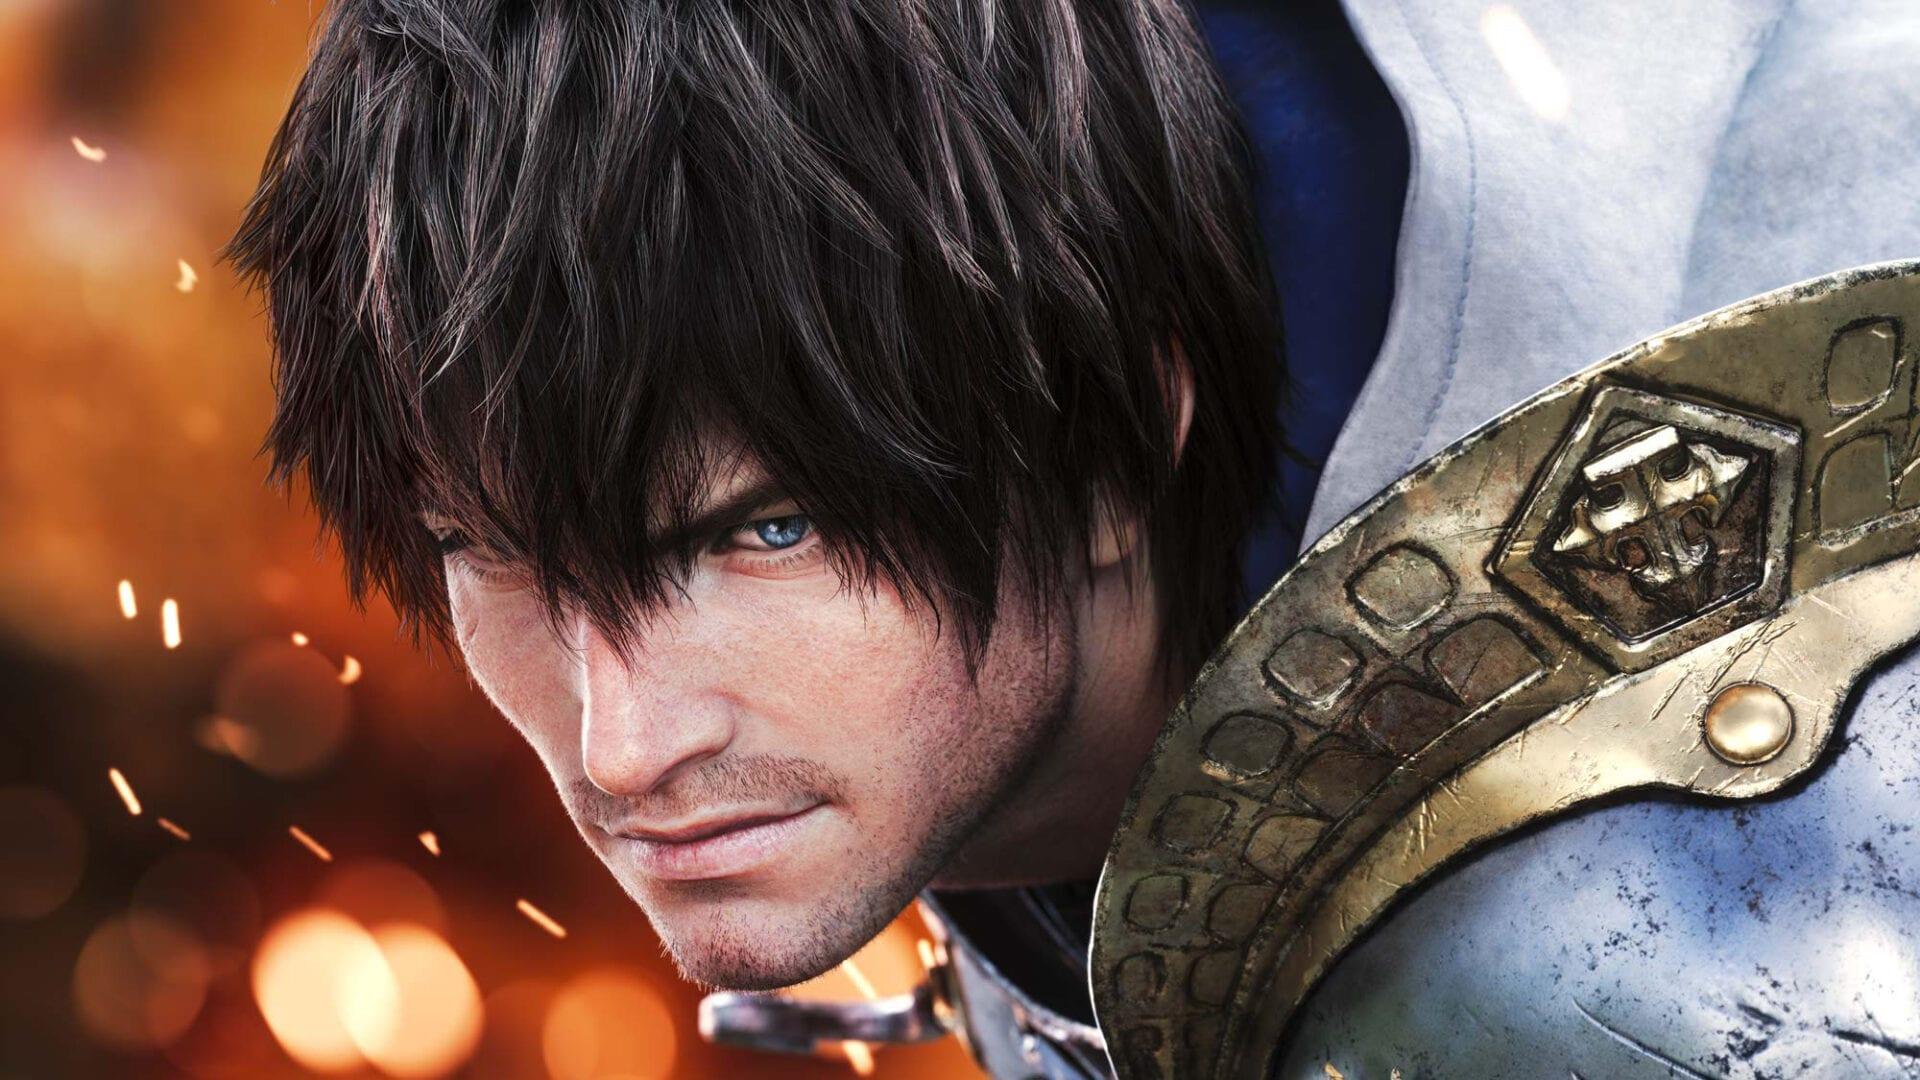 Final Fantasy 14: Endwalker sẽ ra mắt trong tháng 11